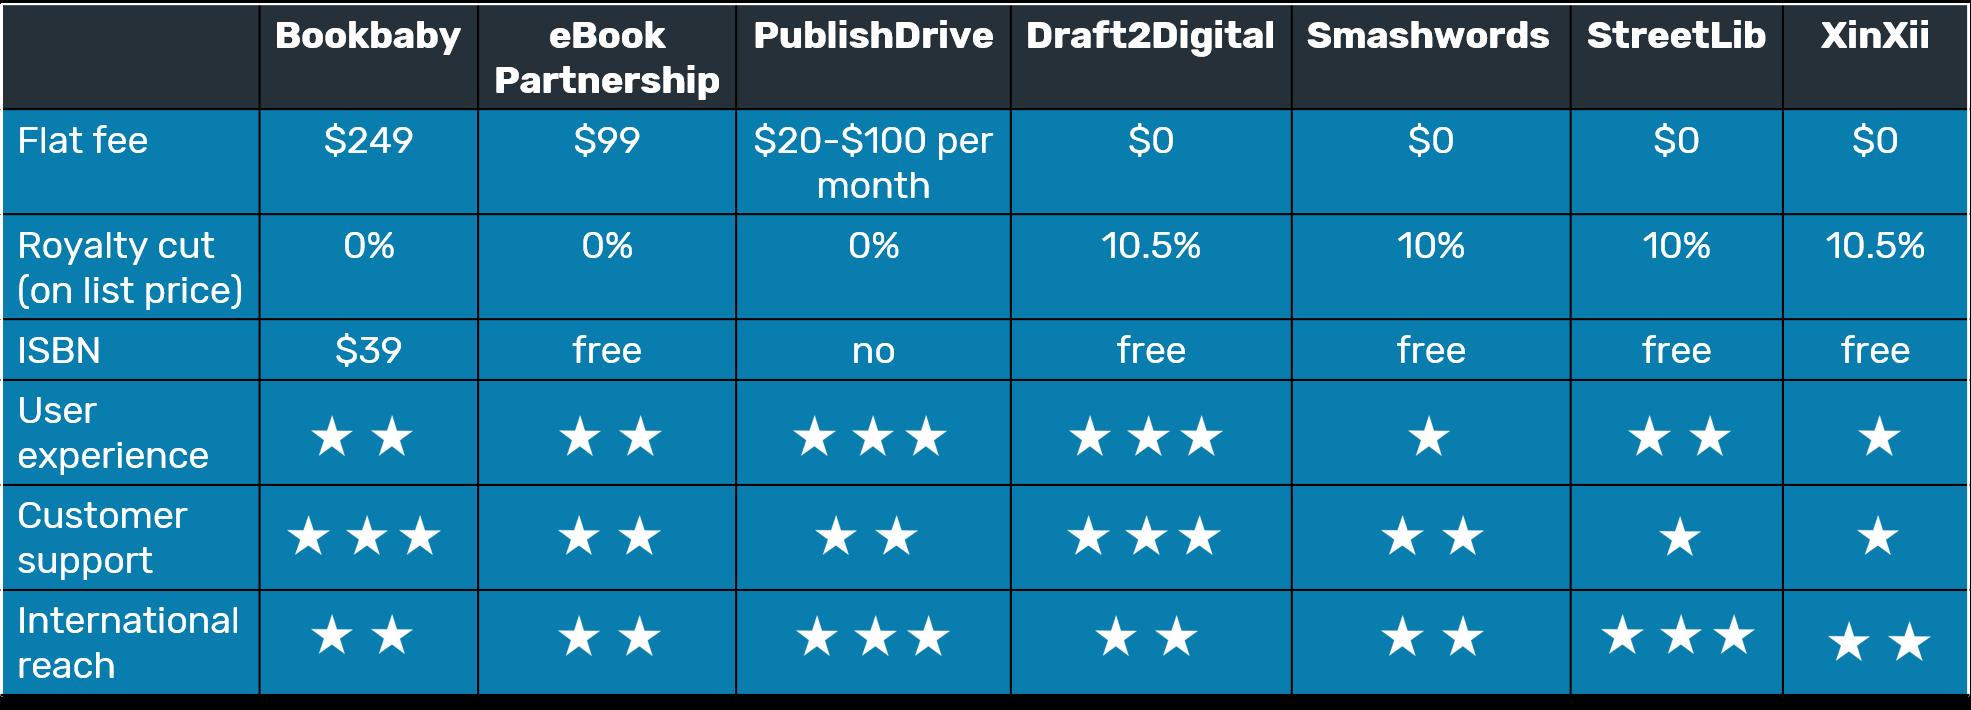 Ebook Distribution | Table comparing book aggregators